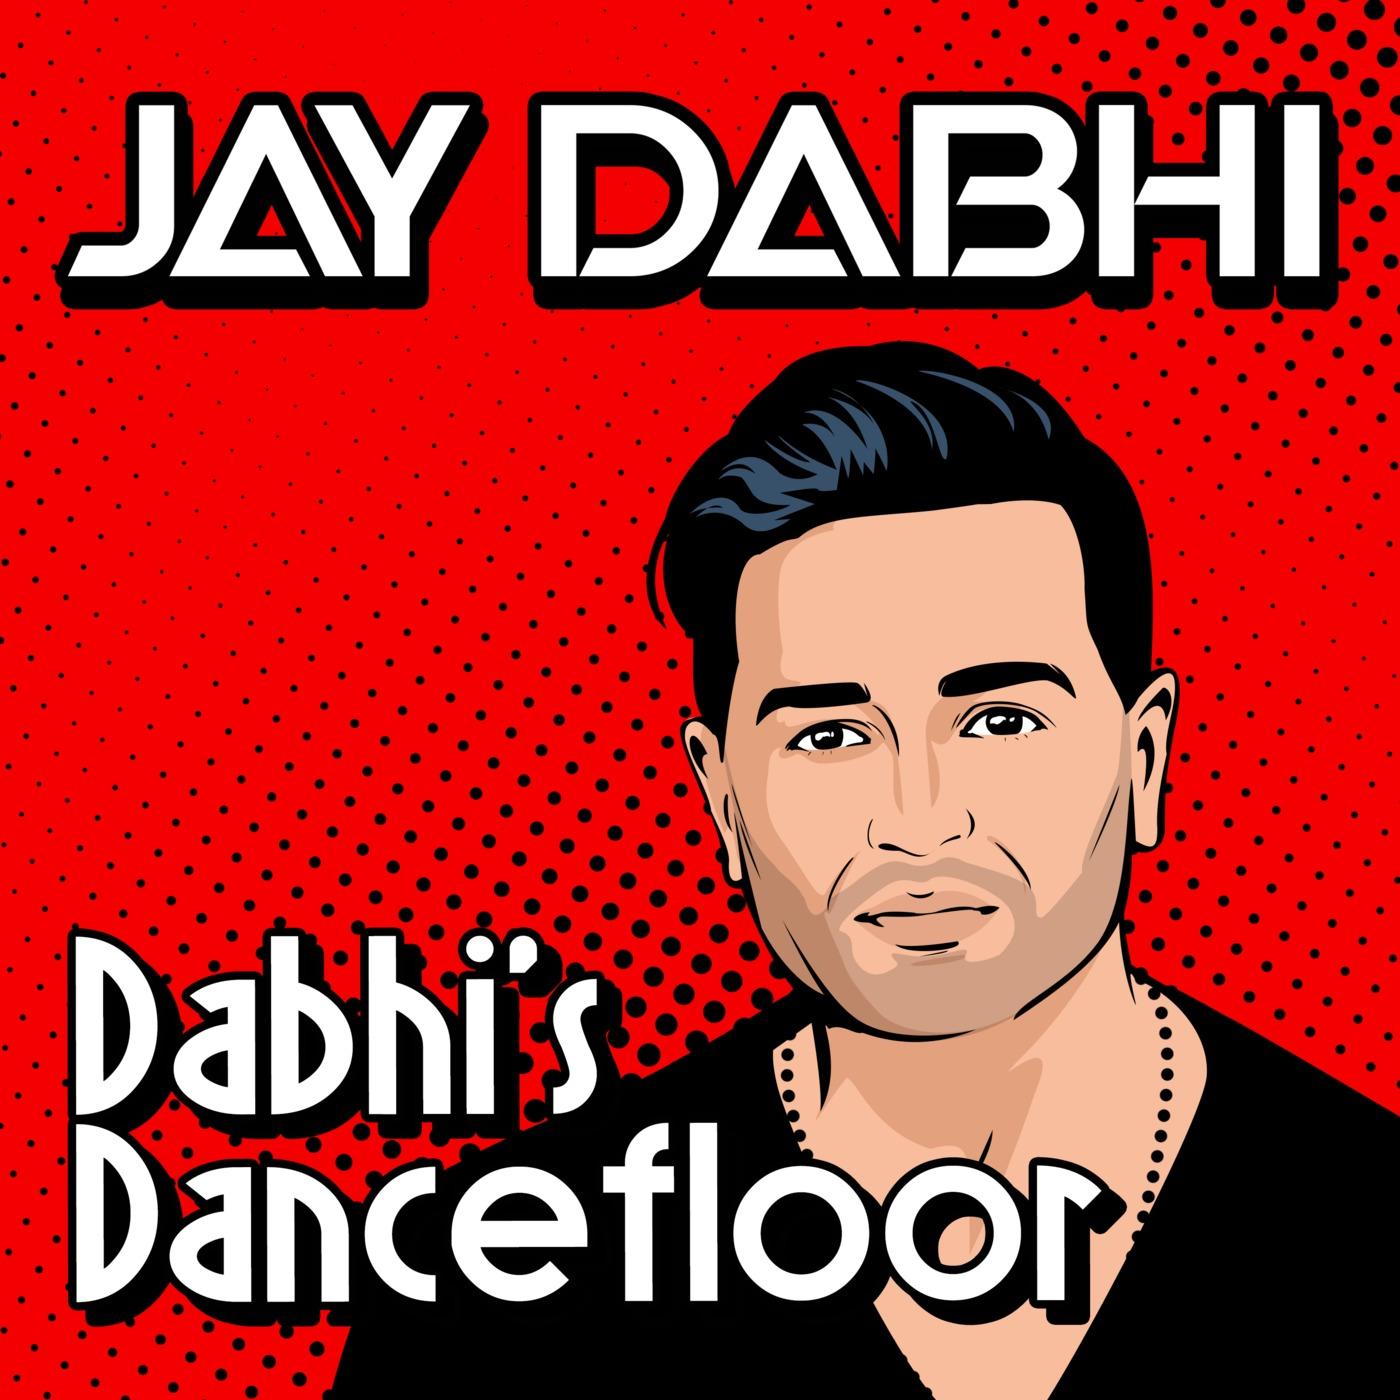 151 - Live On SiriusXM Saturdays 9pm ET Dabhi's Dancefloor podcast